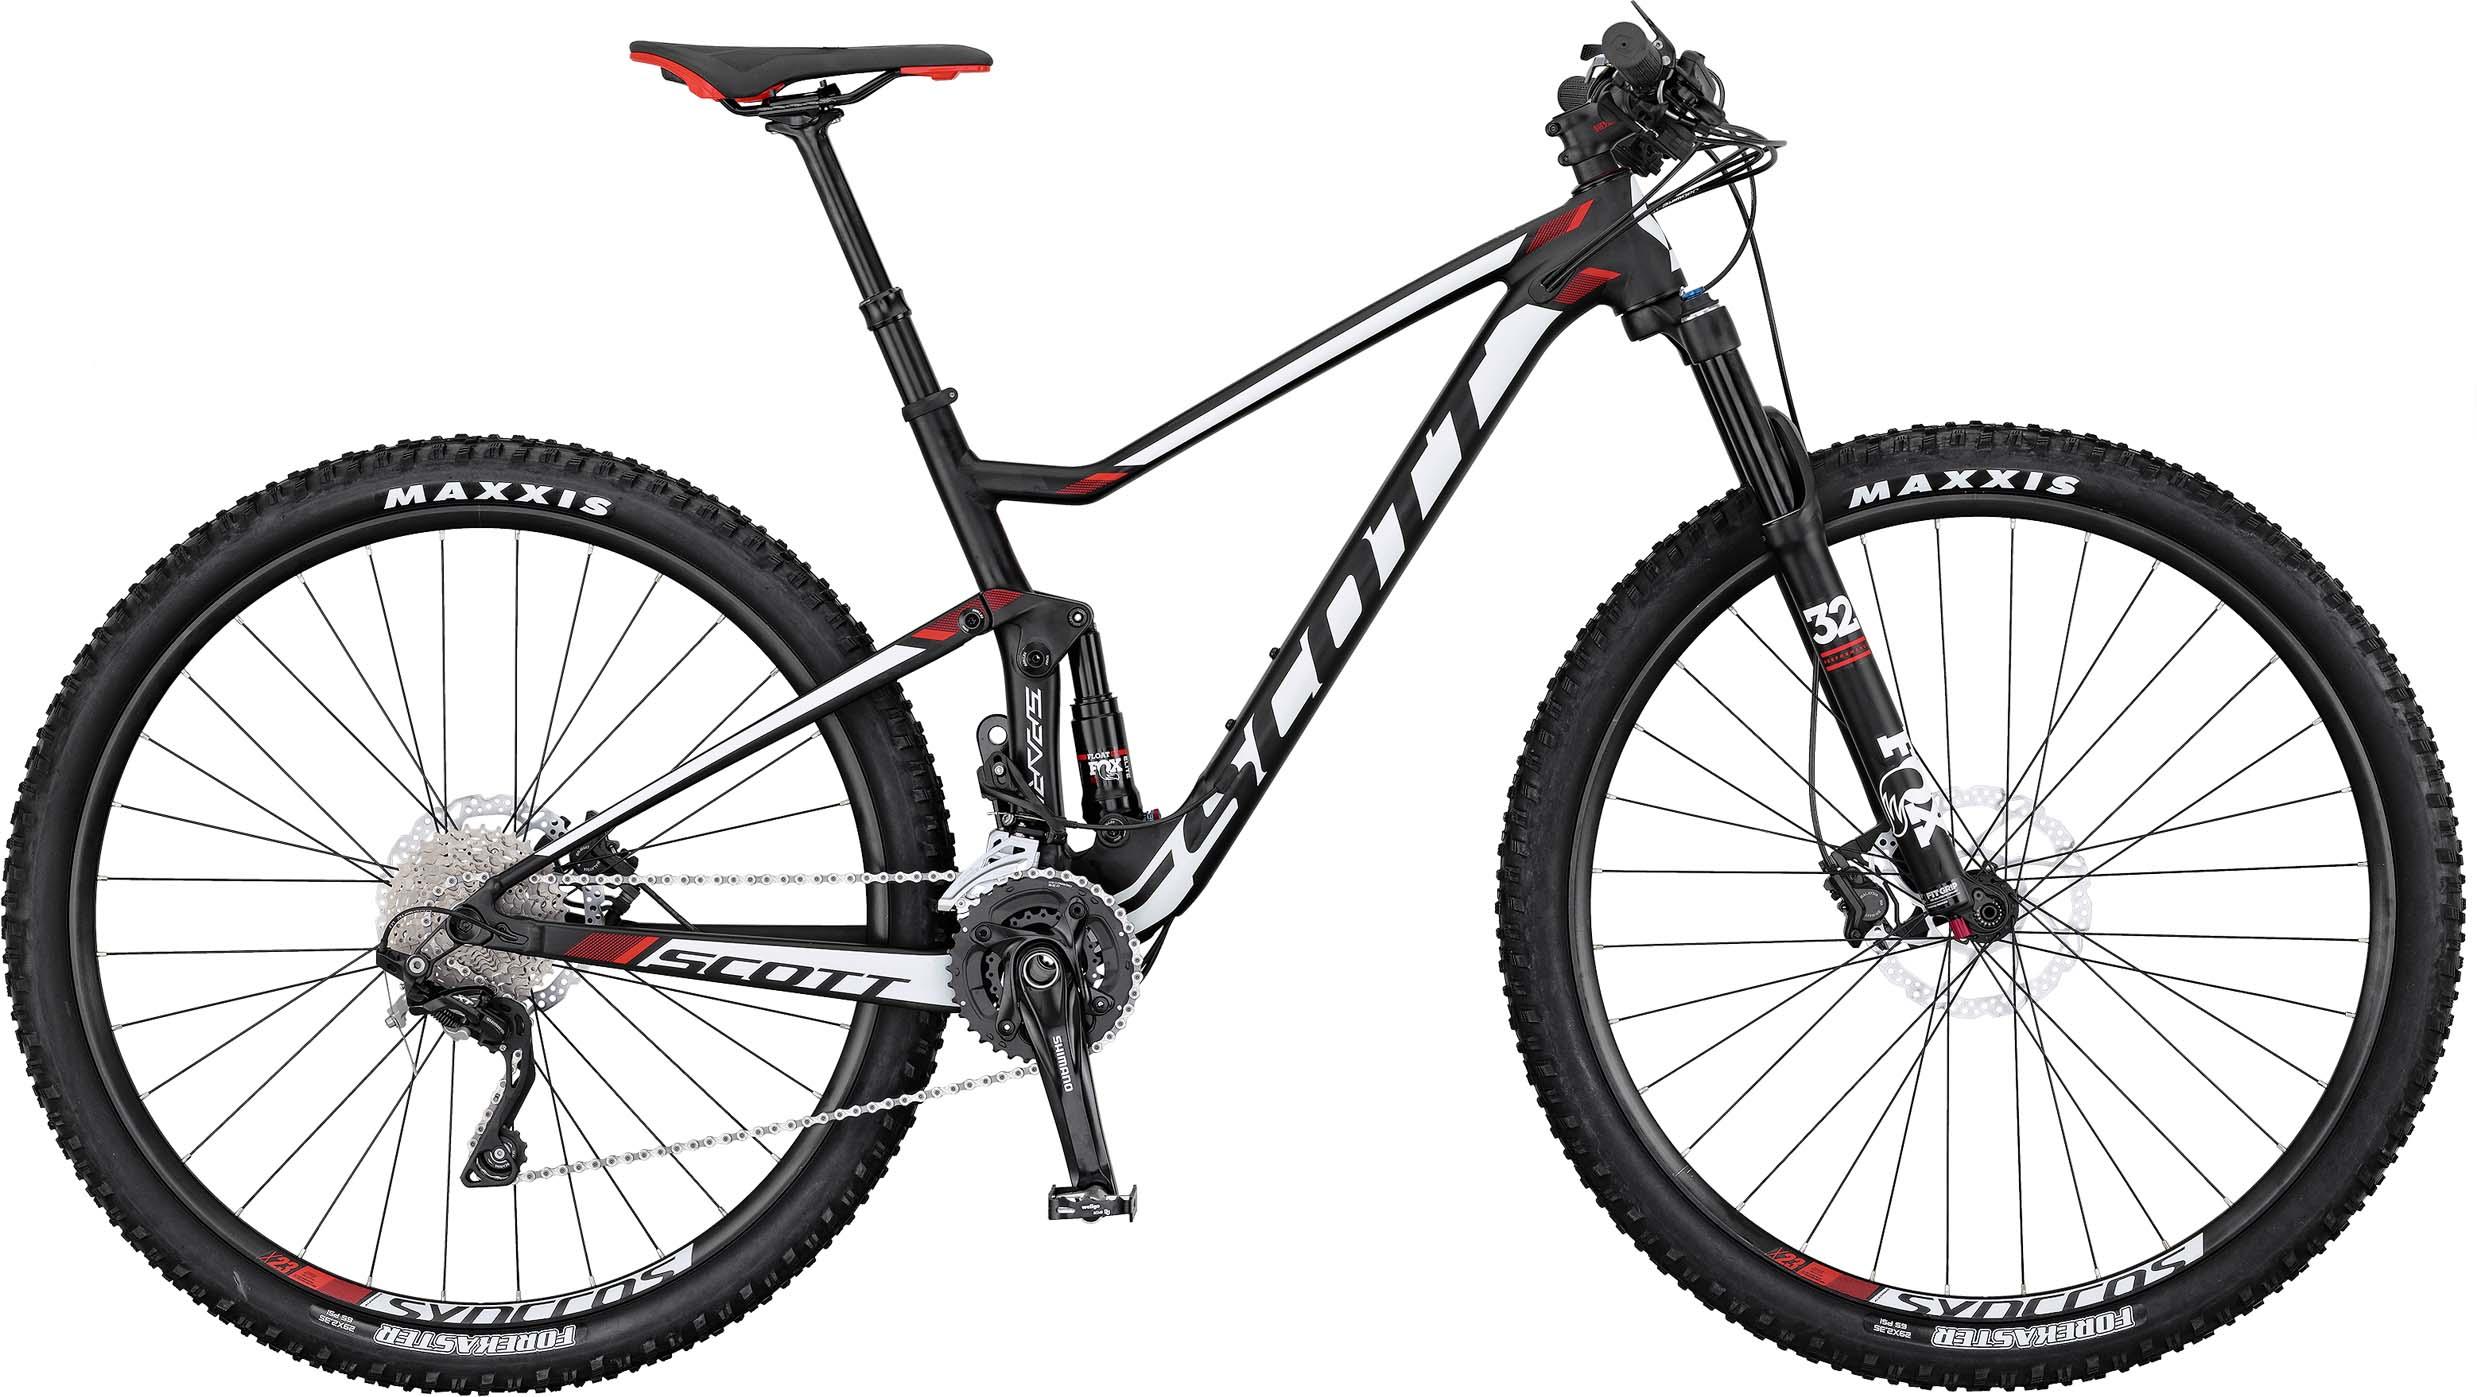 Scott Spark 950 Fully Mountainbike ▷ online cheaply ▷ mhw